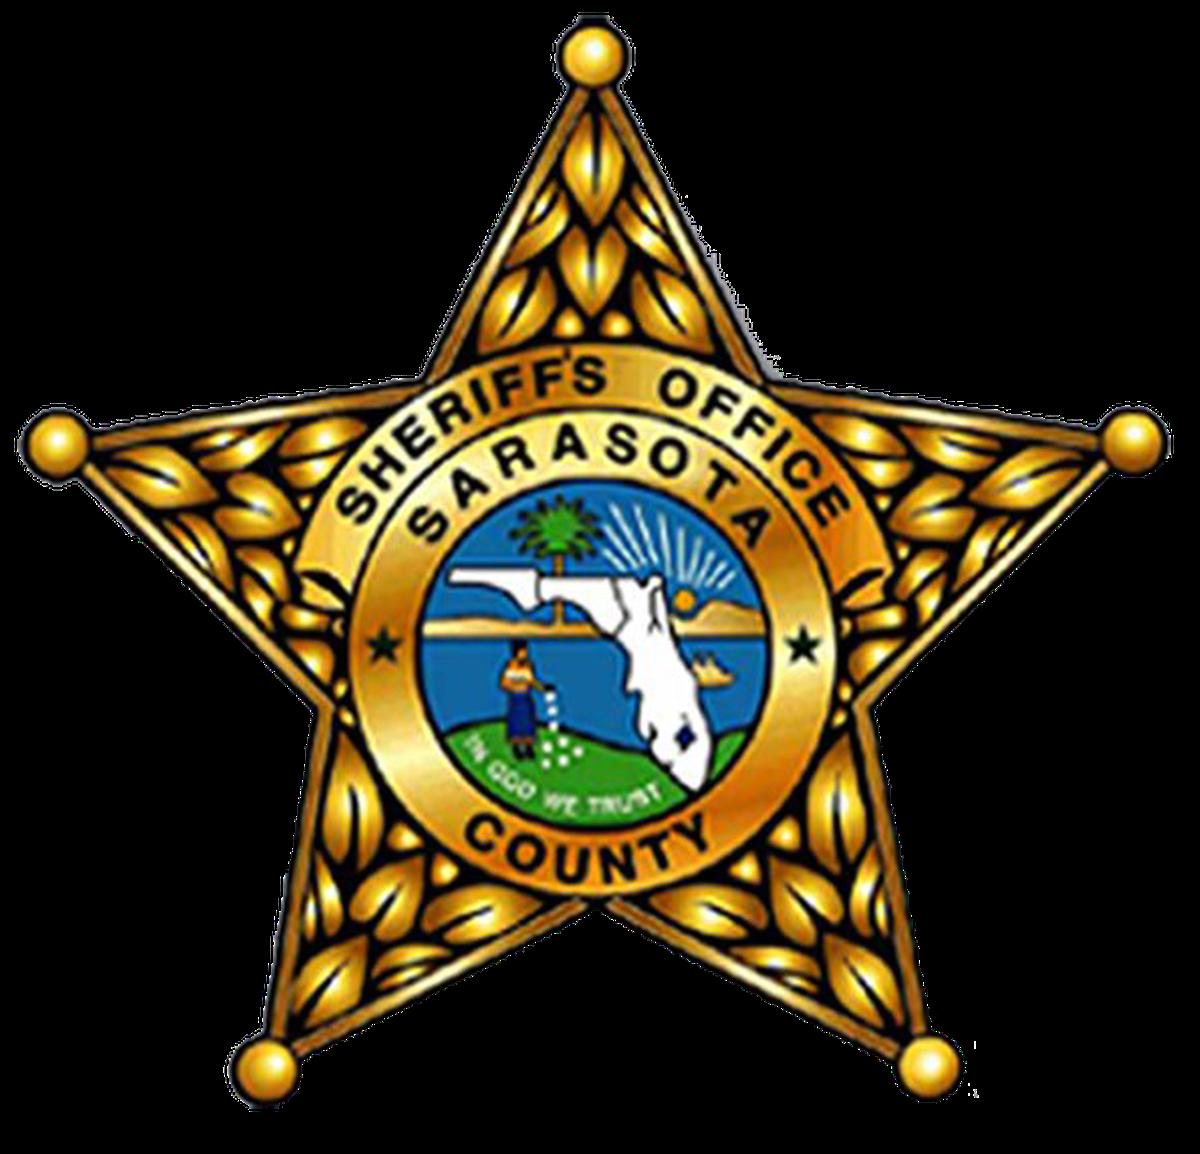 ABC7: Sarasota County Sheriff to close its South County facility.